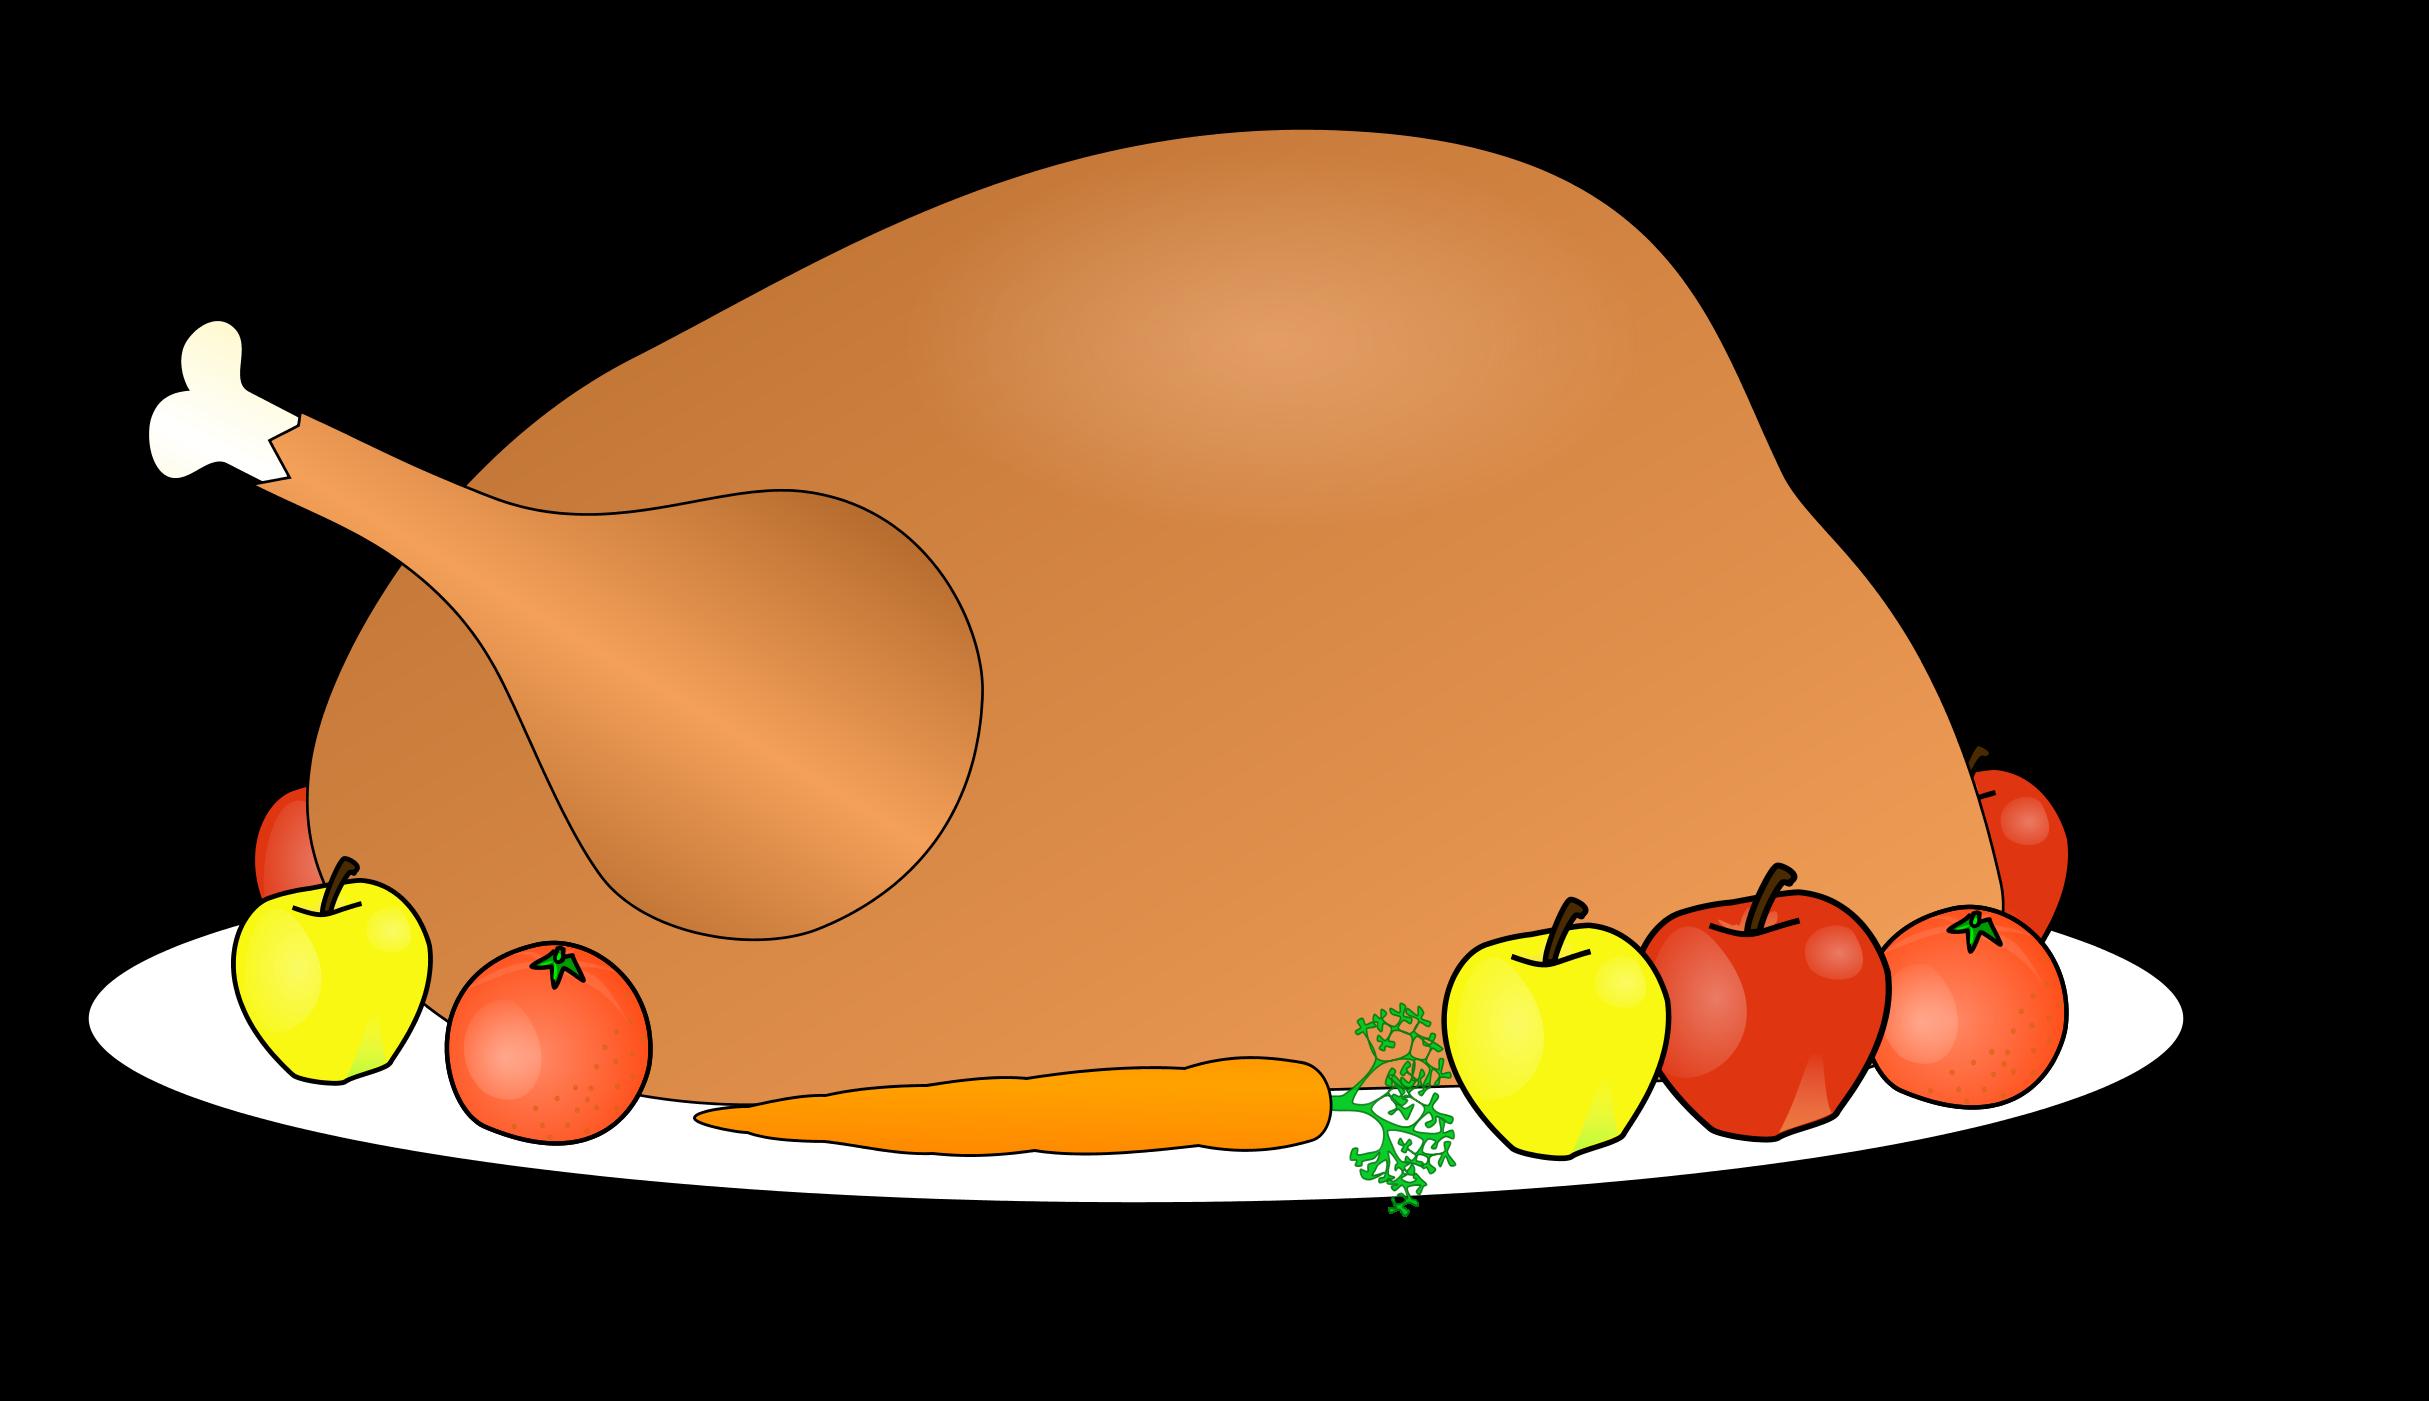 Cooked turkey leg clipart